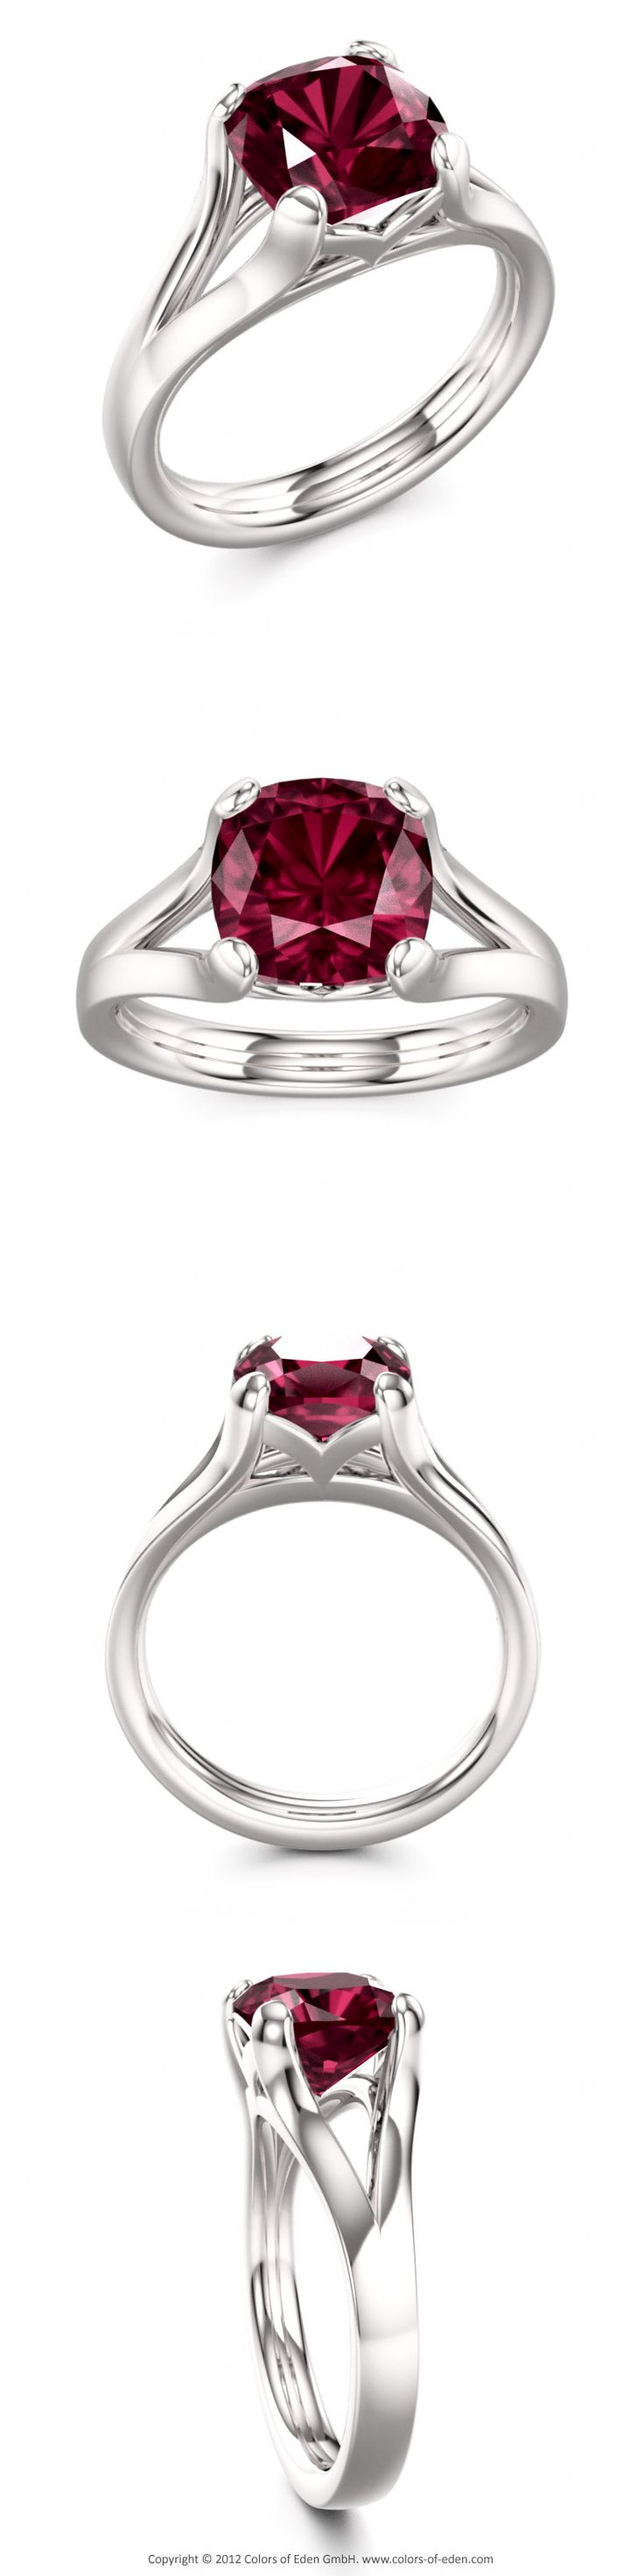 Rhodolite Garnet Engagement Ring